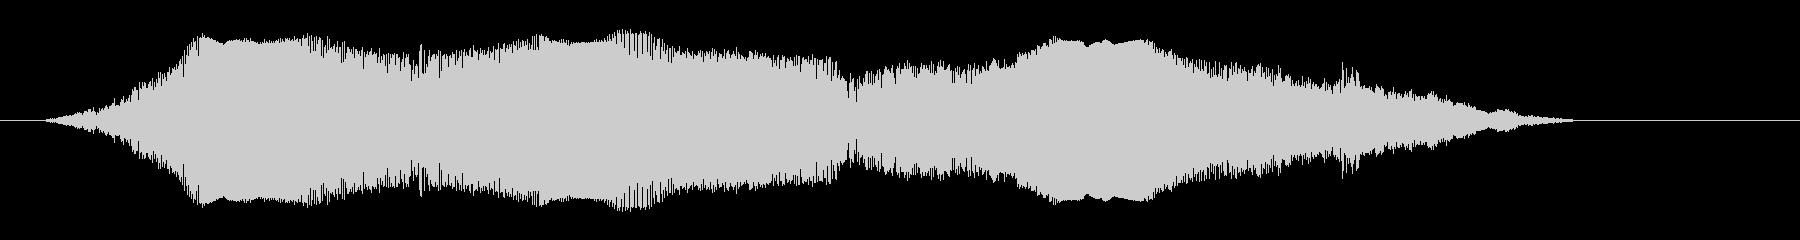 Fia Gt Car;アウトオブタ...の未再生の波形